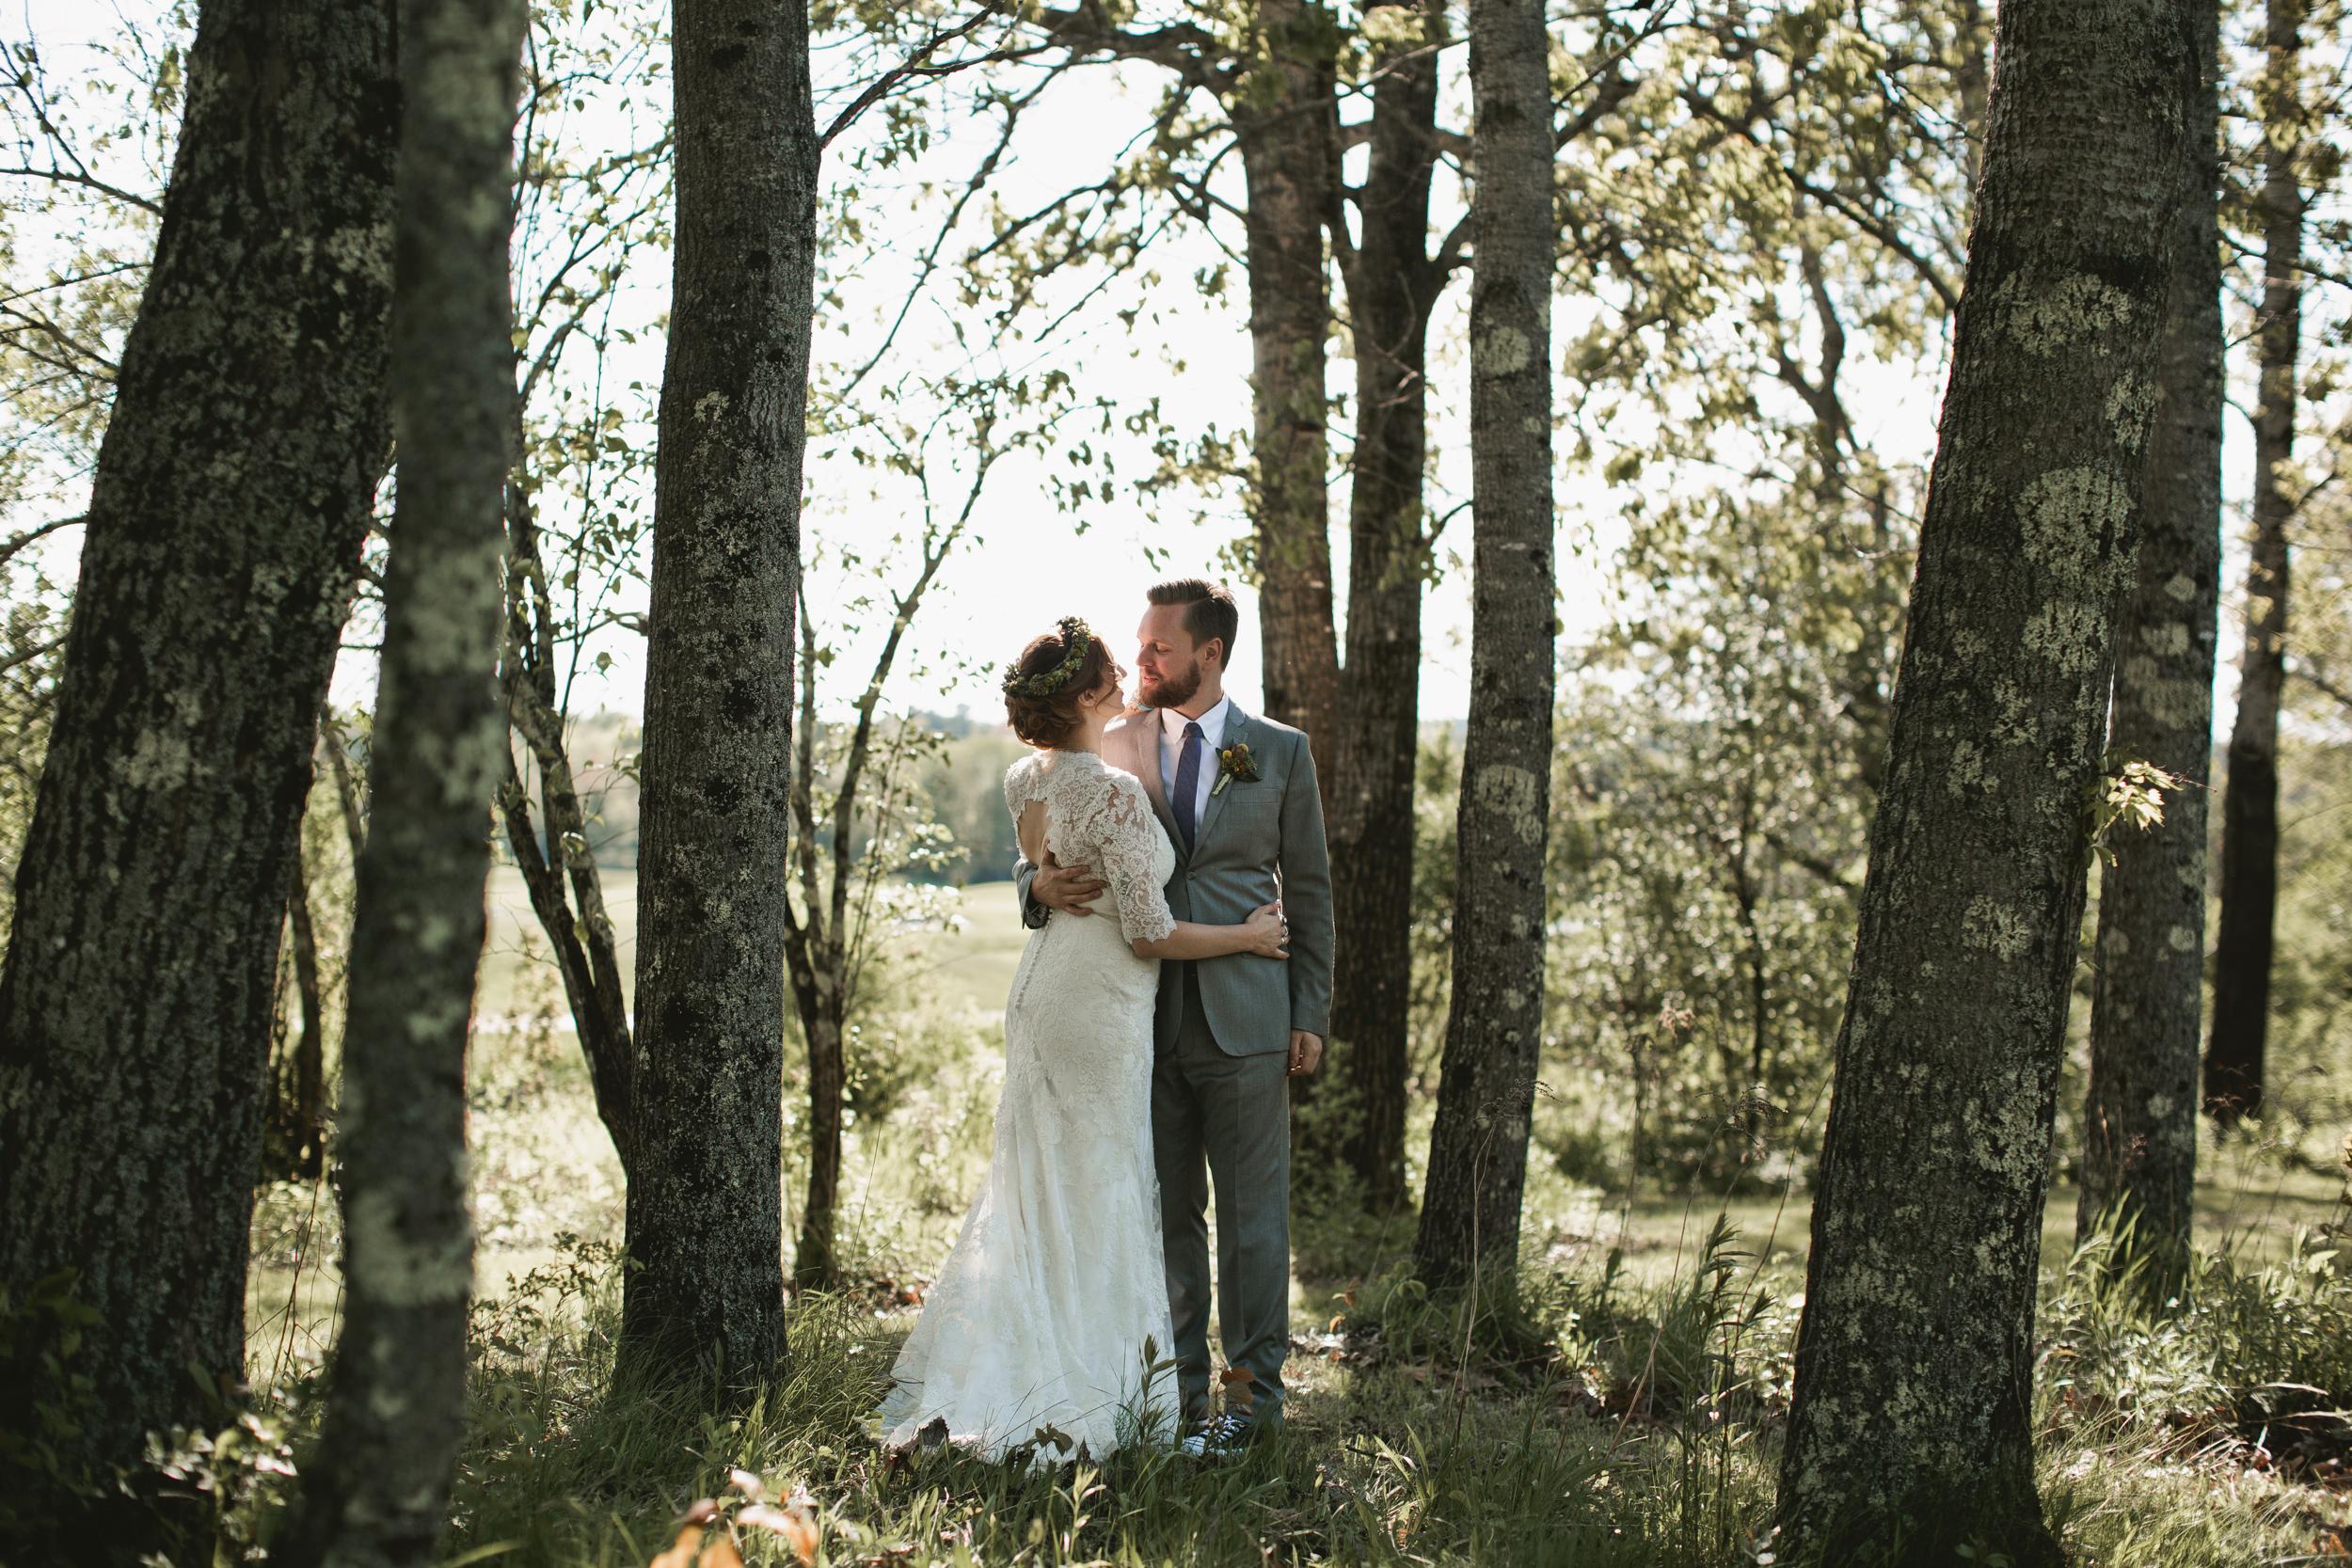 Spring-Meadows-Maine-Wedding-135.jpg